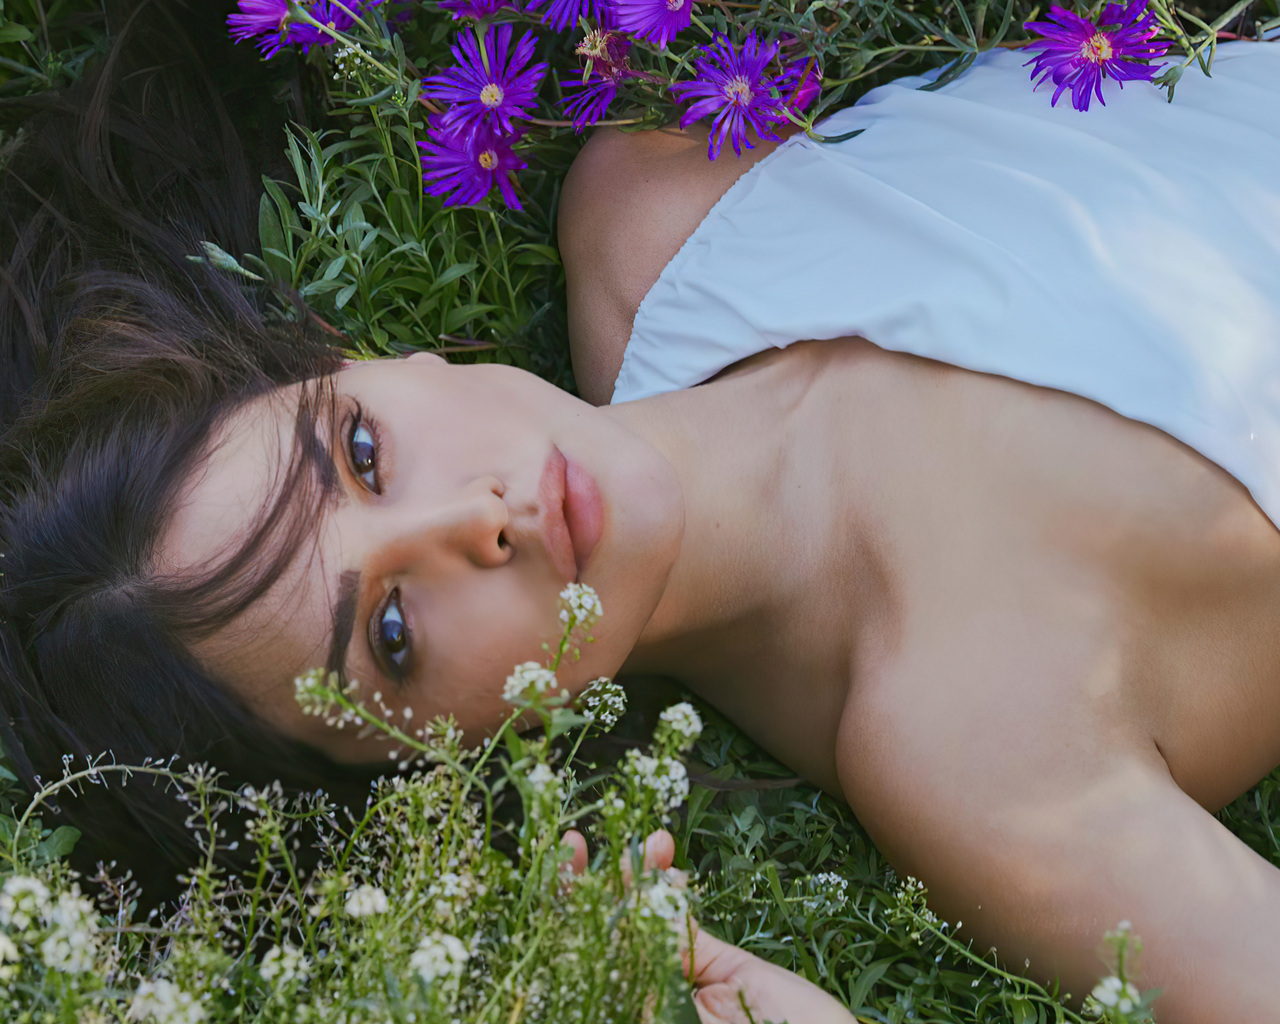 eiza-gonzalez-photoshoot-for-the-amazing-magazine-n-spring-summer-2021-oj.jpg